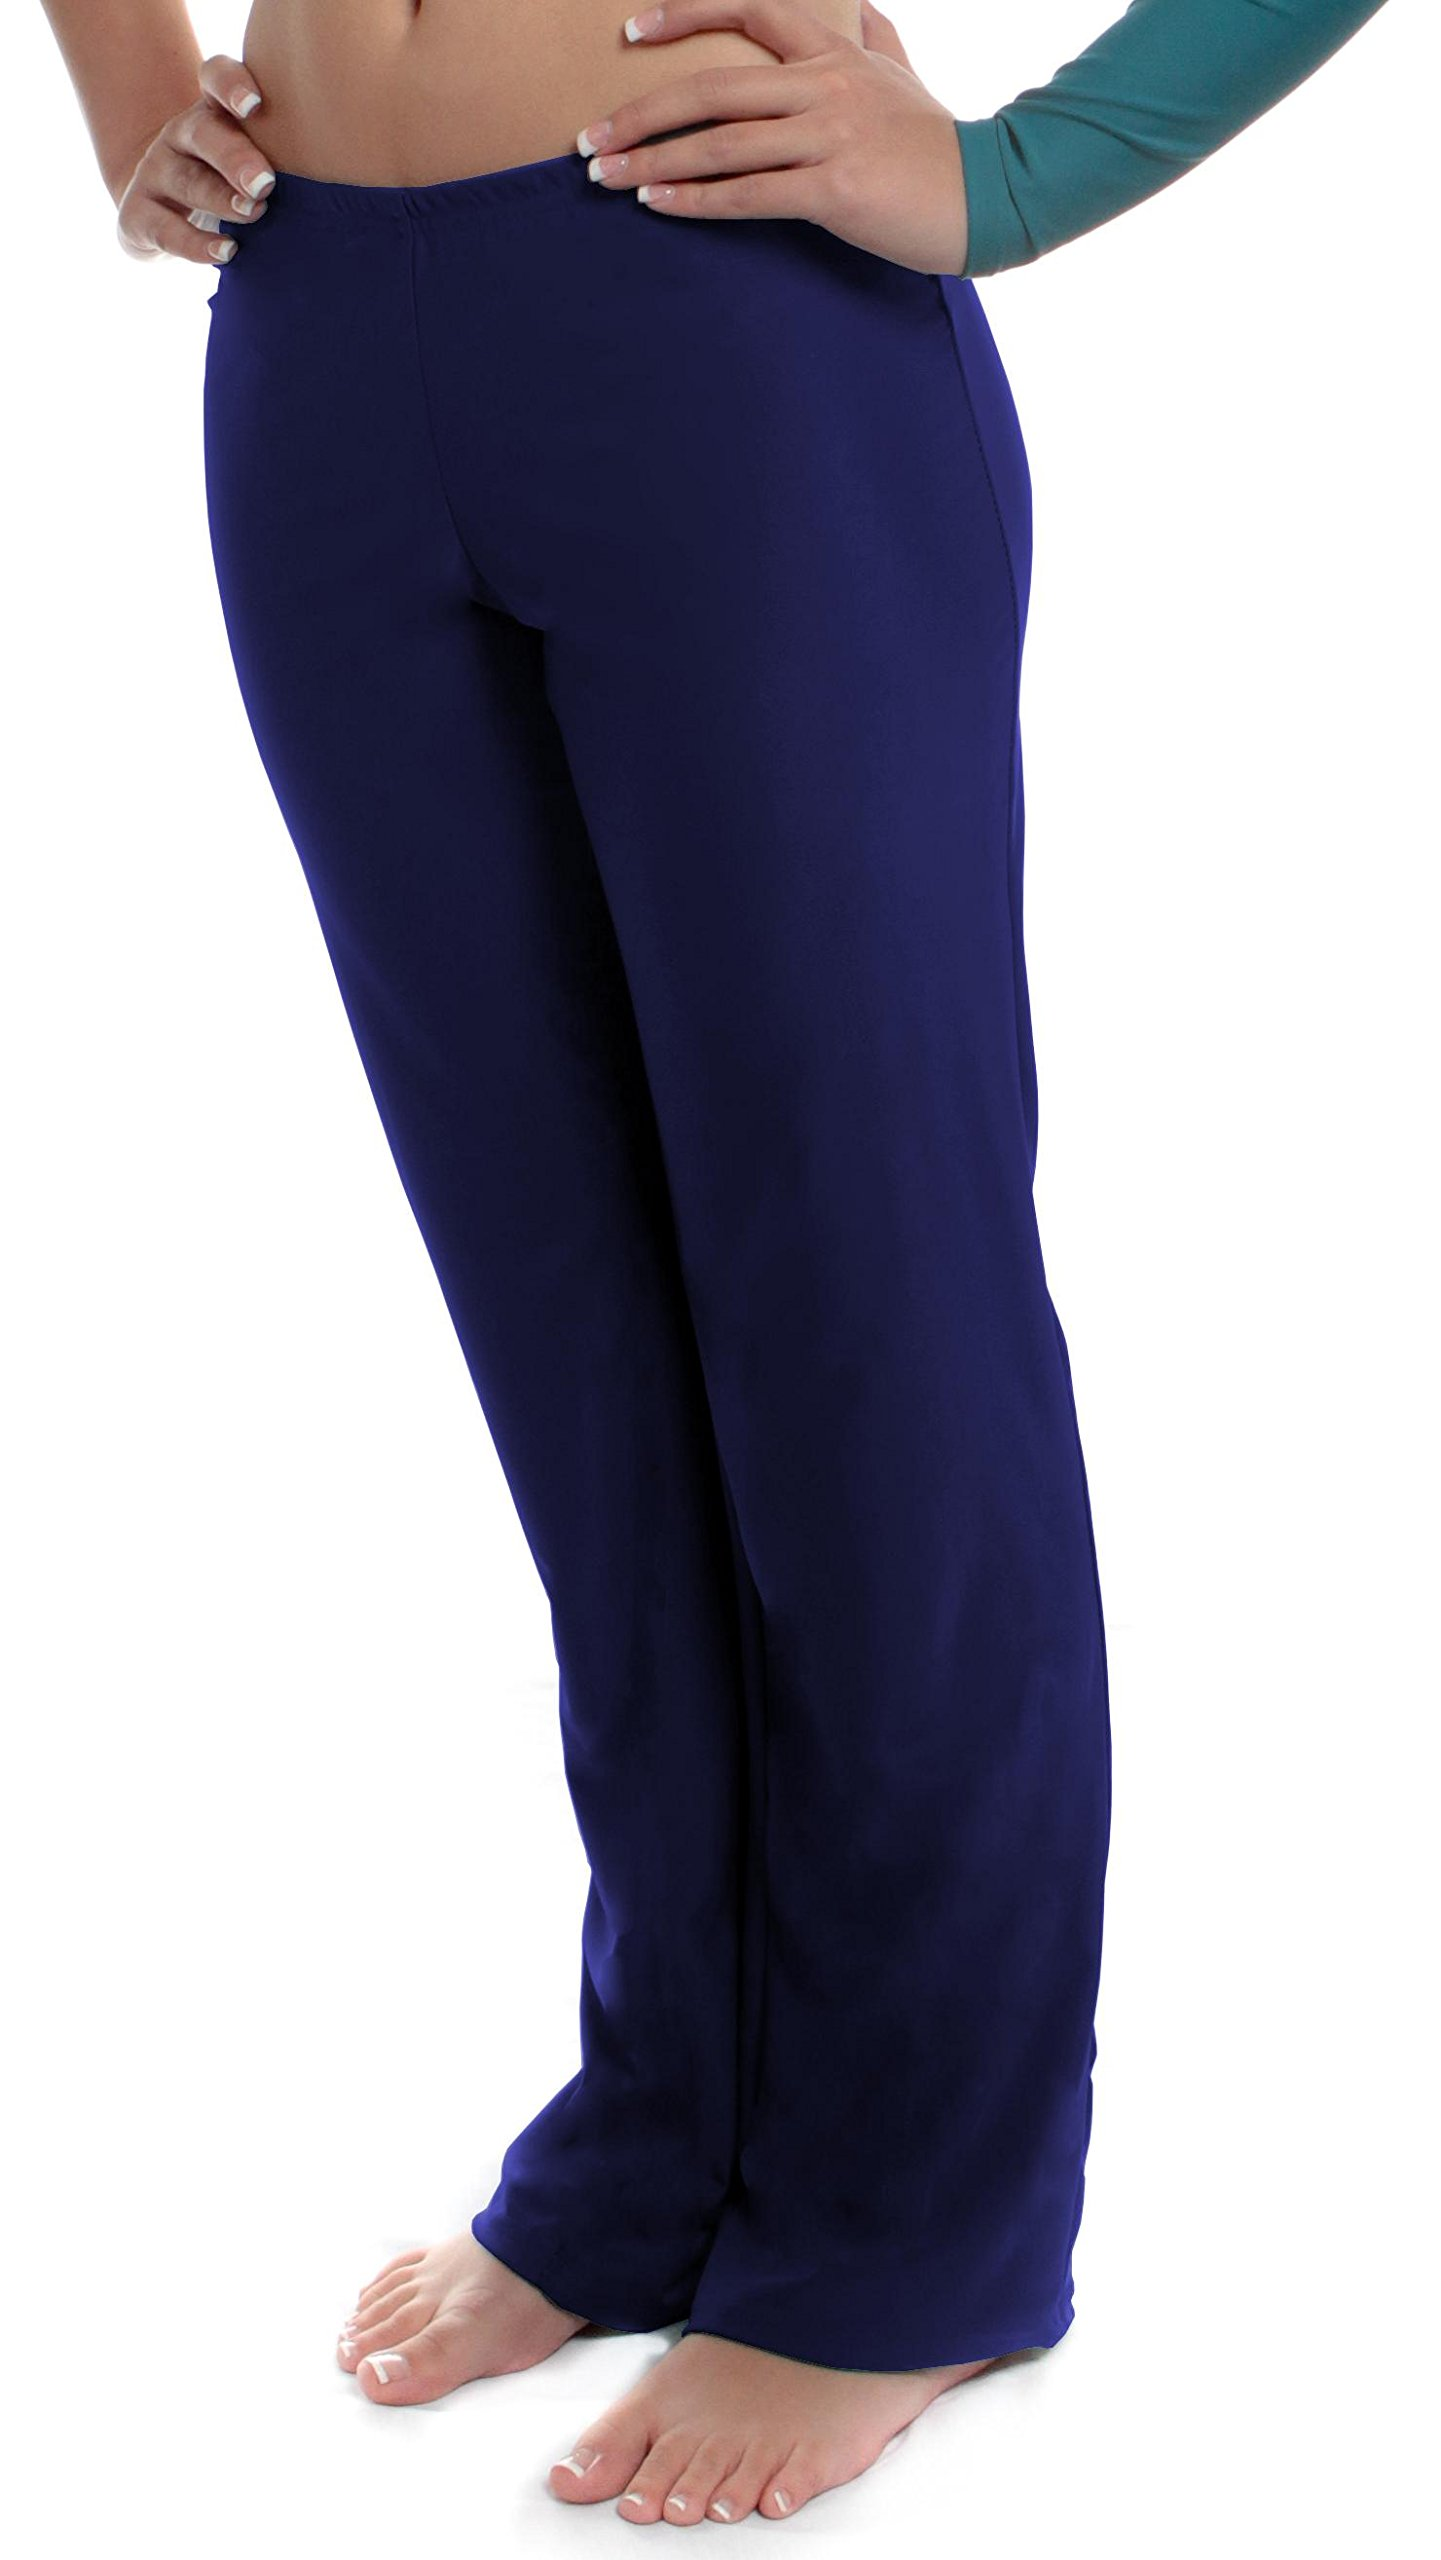 B Dancewear Girls Jazz Pants X-Large Navy Child and Kid Sizes by B Dancewear